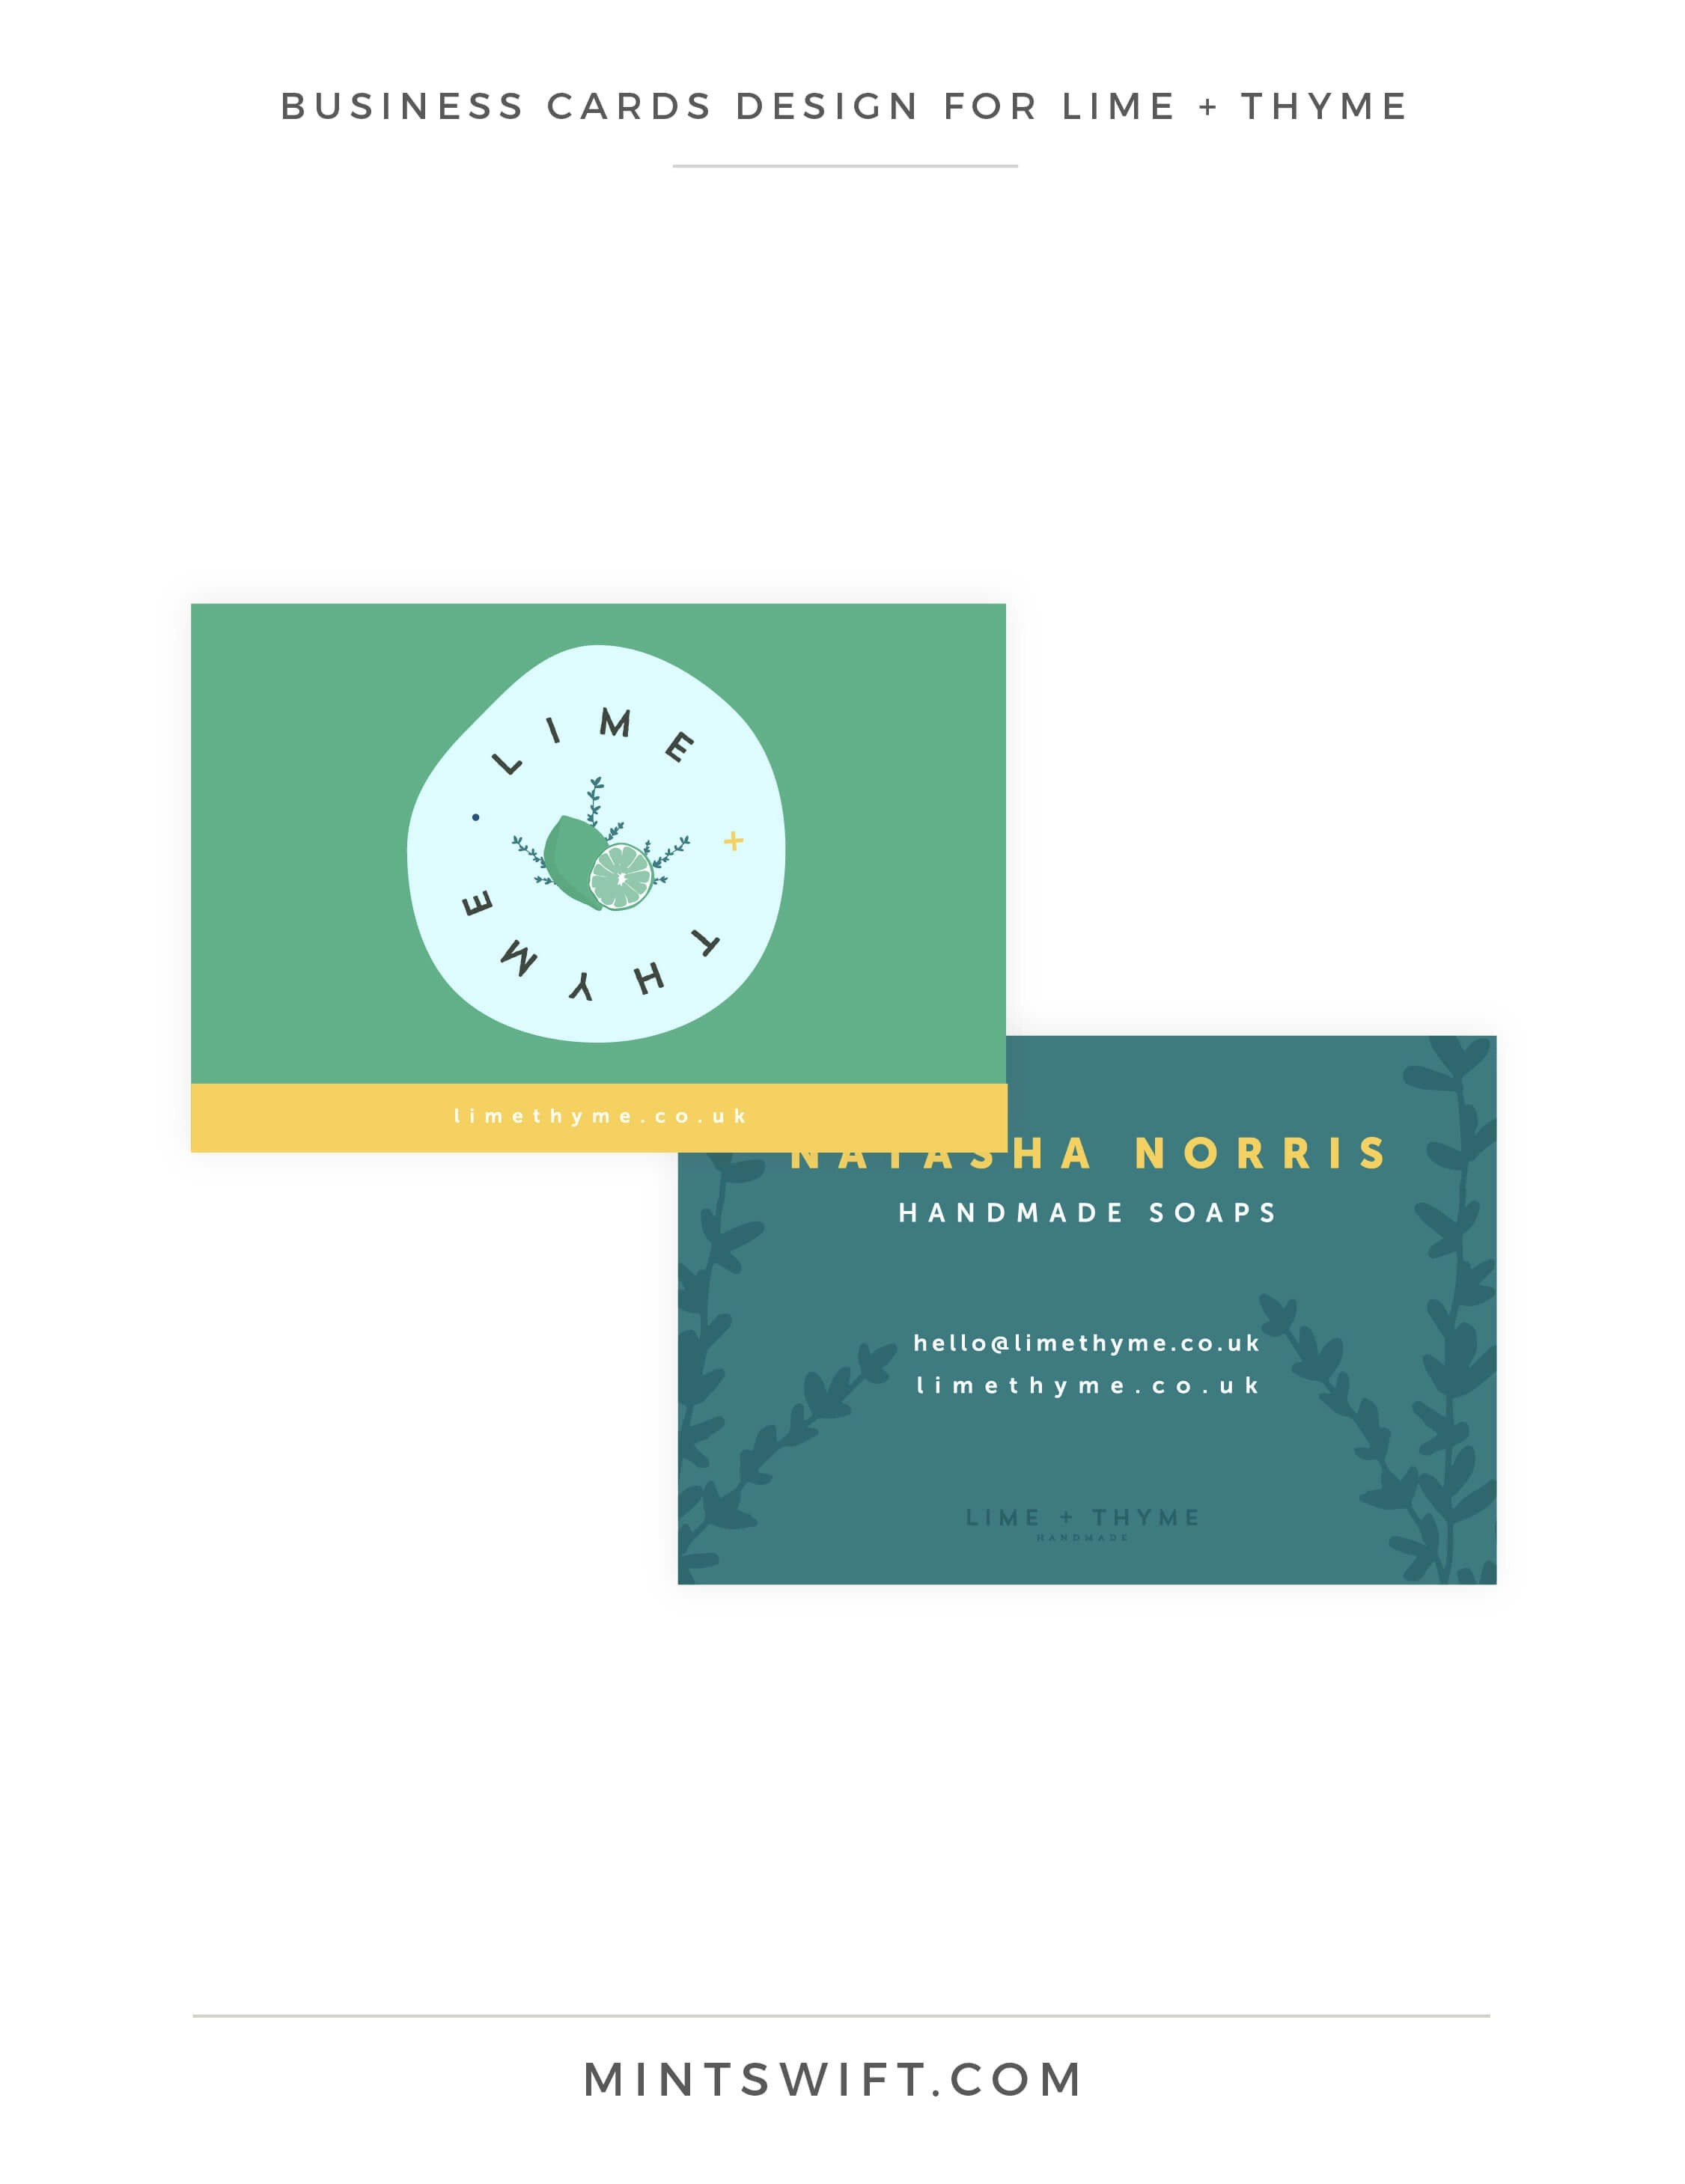 Lime + Thyme - Business Cards Design - Brand & Website Design - MintSwift